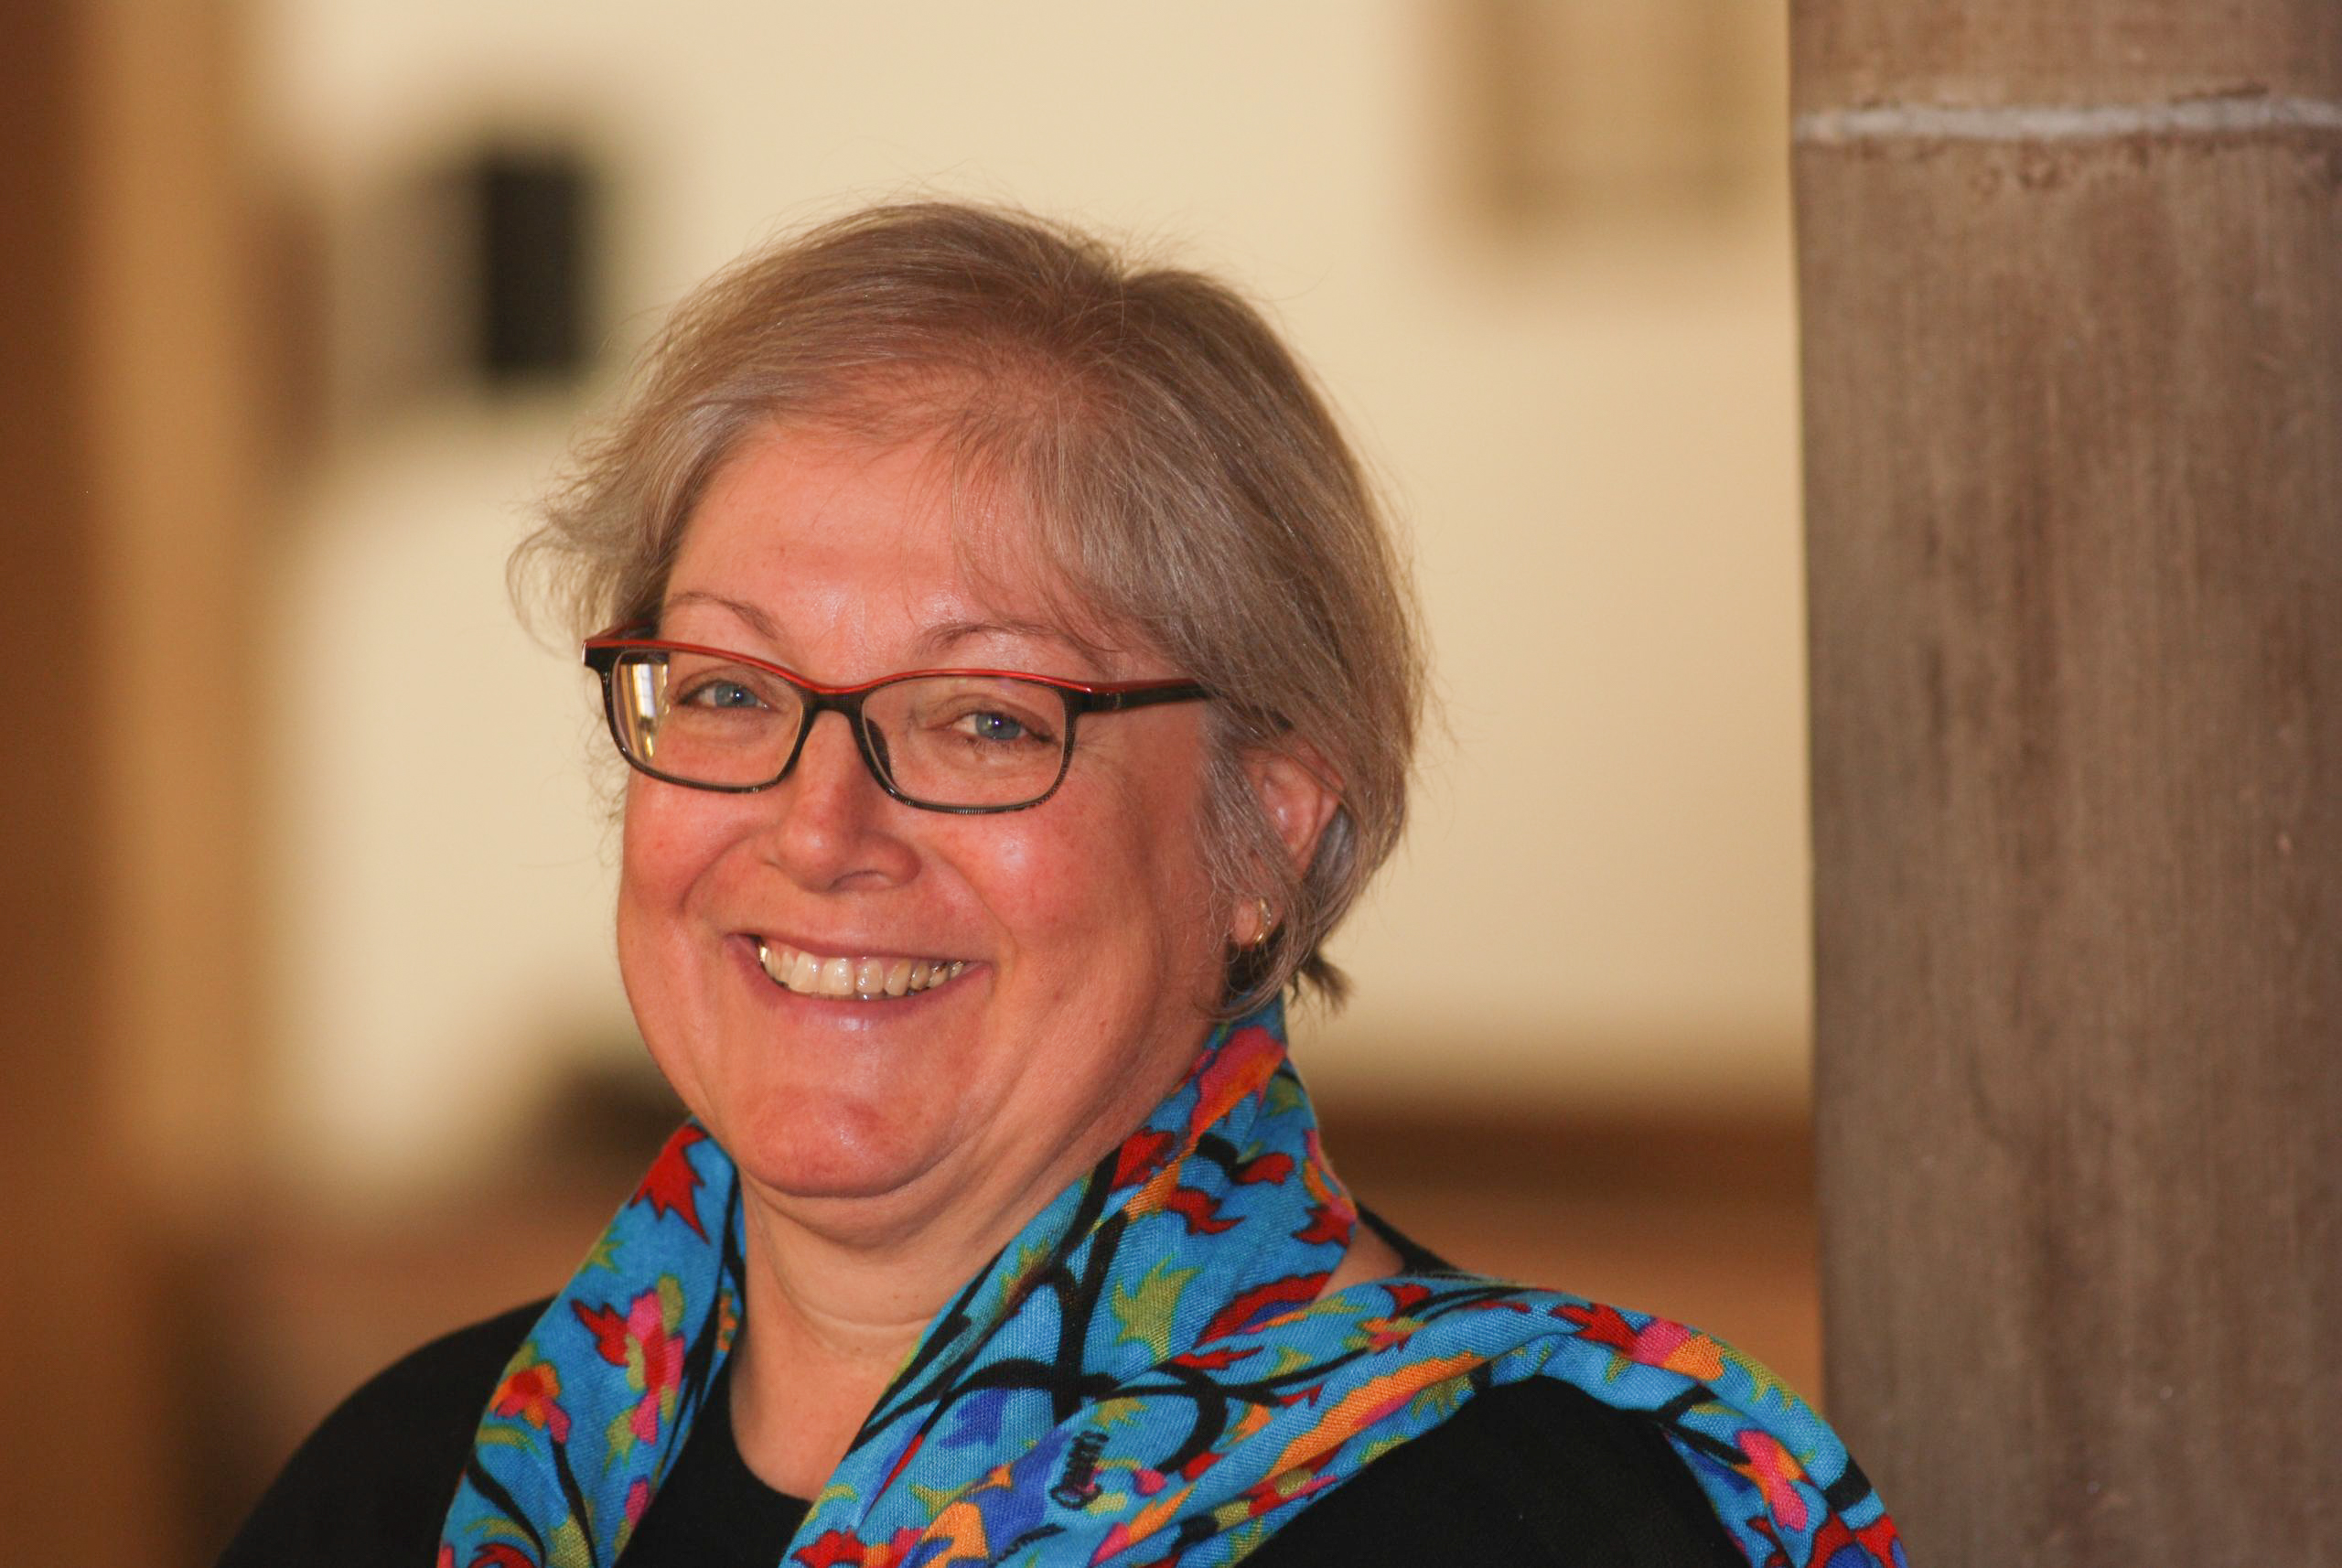 Dr. Petra Bernicke